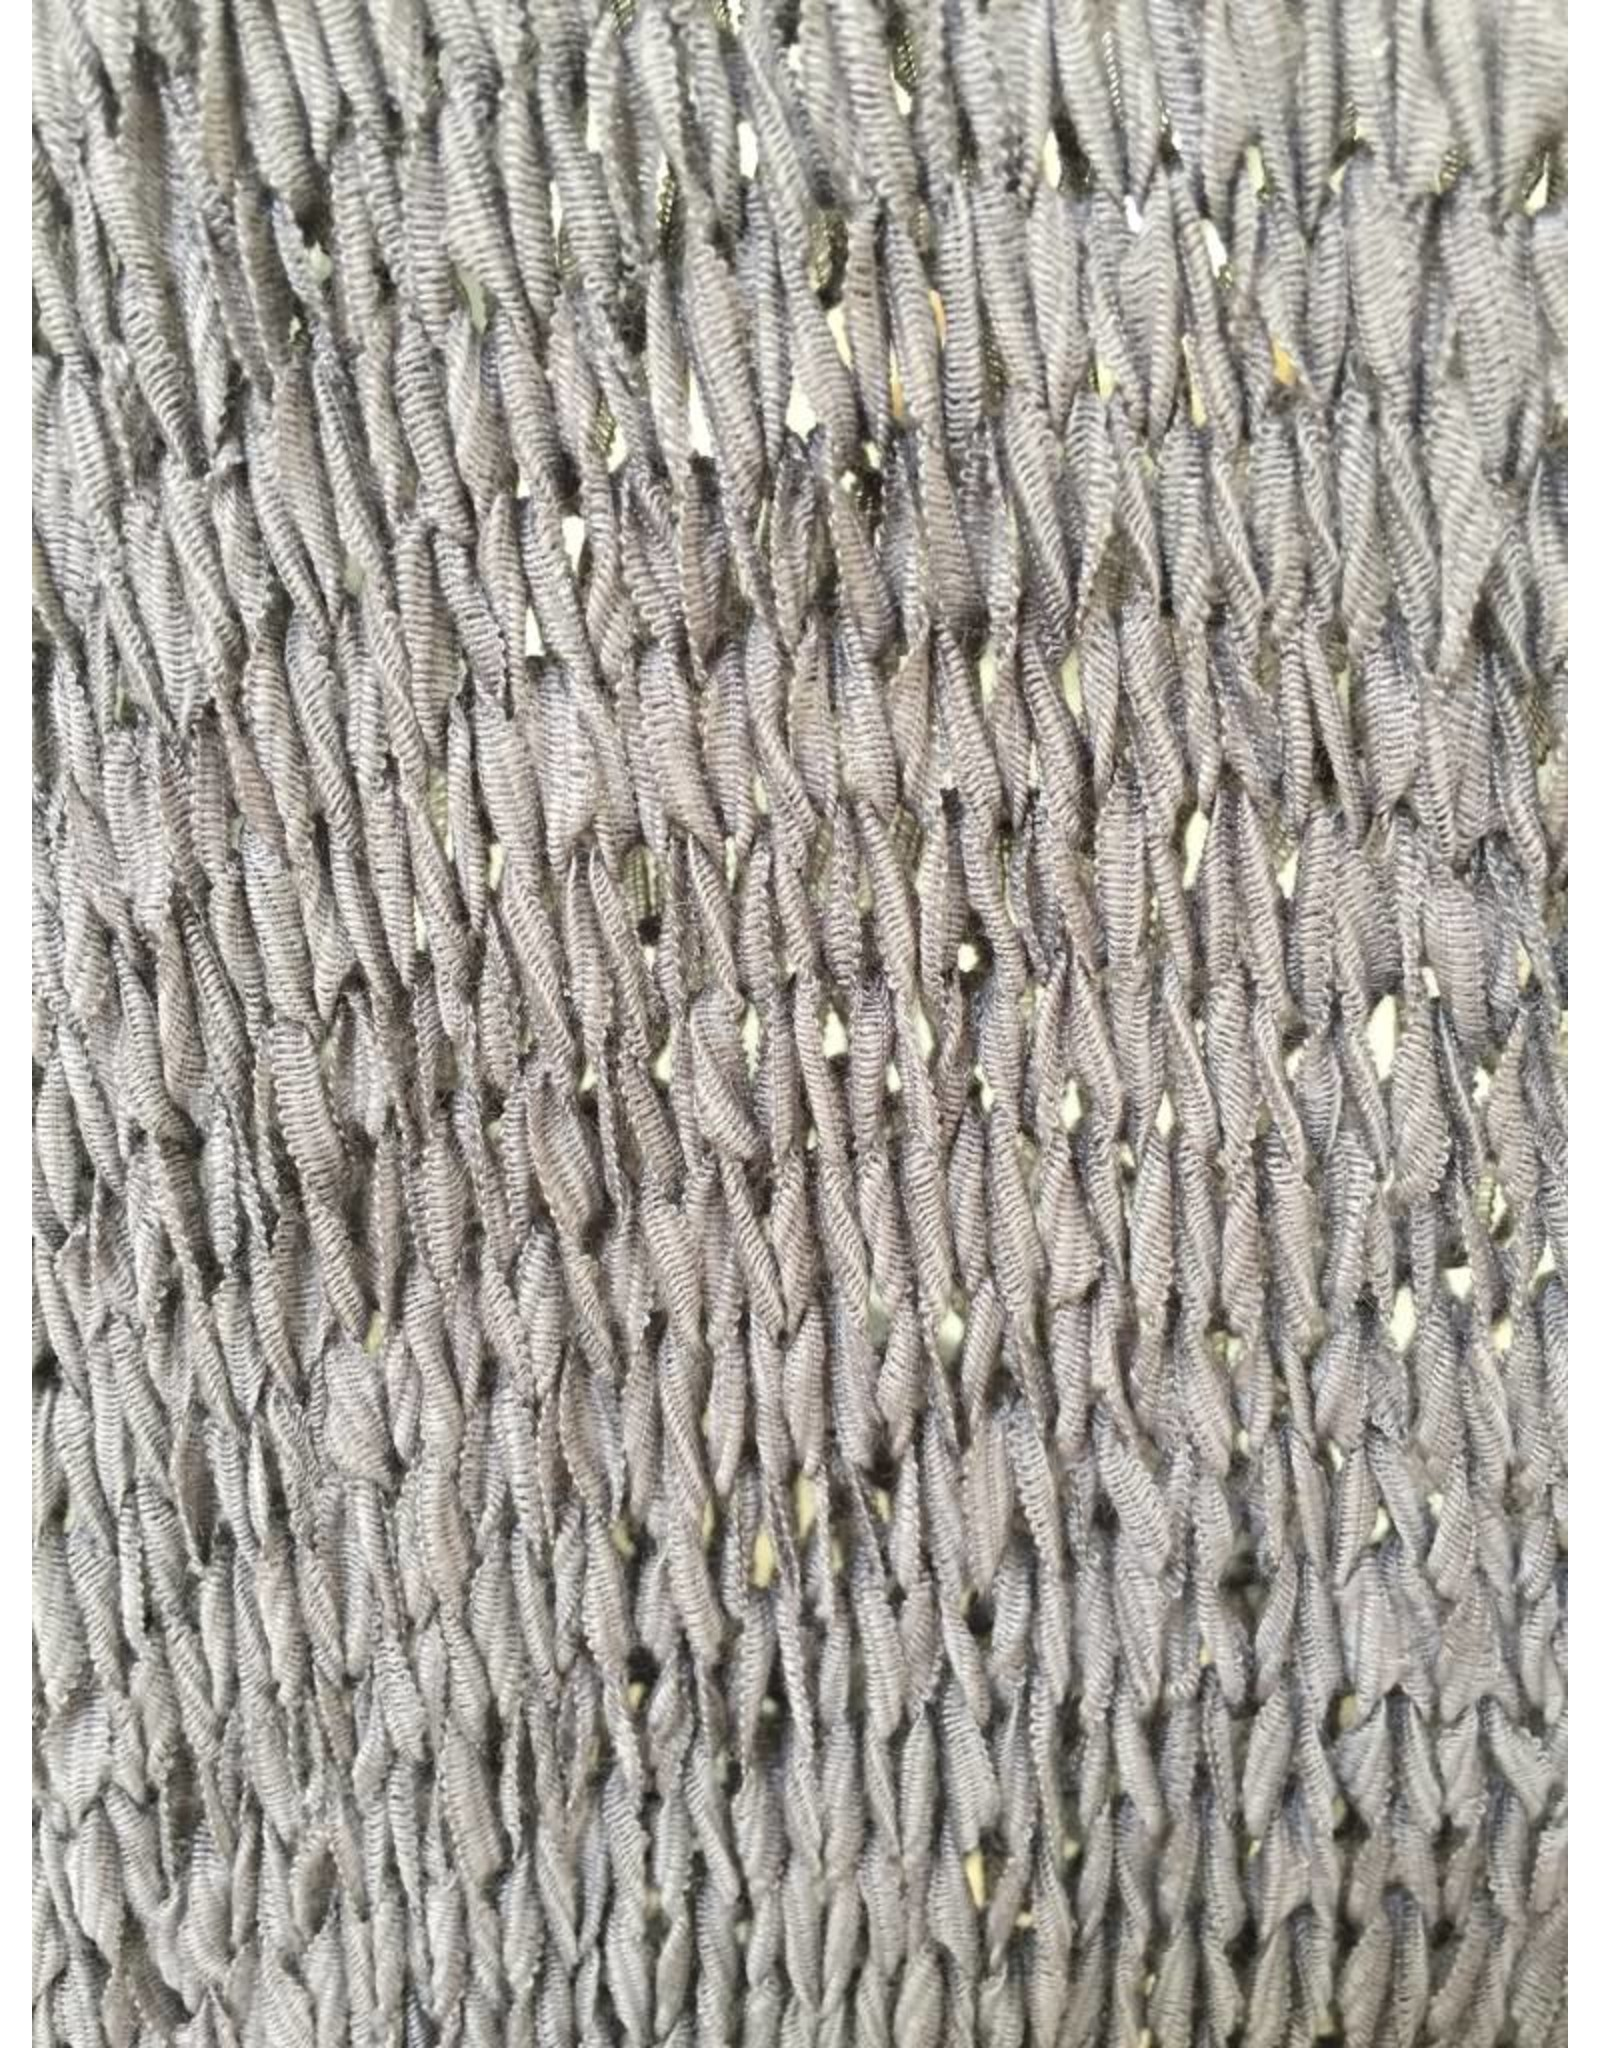 Souvenir Clubbing Knitted cardigan